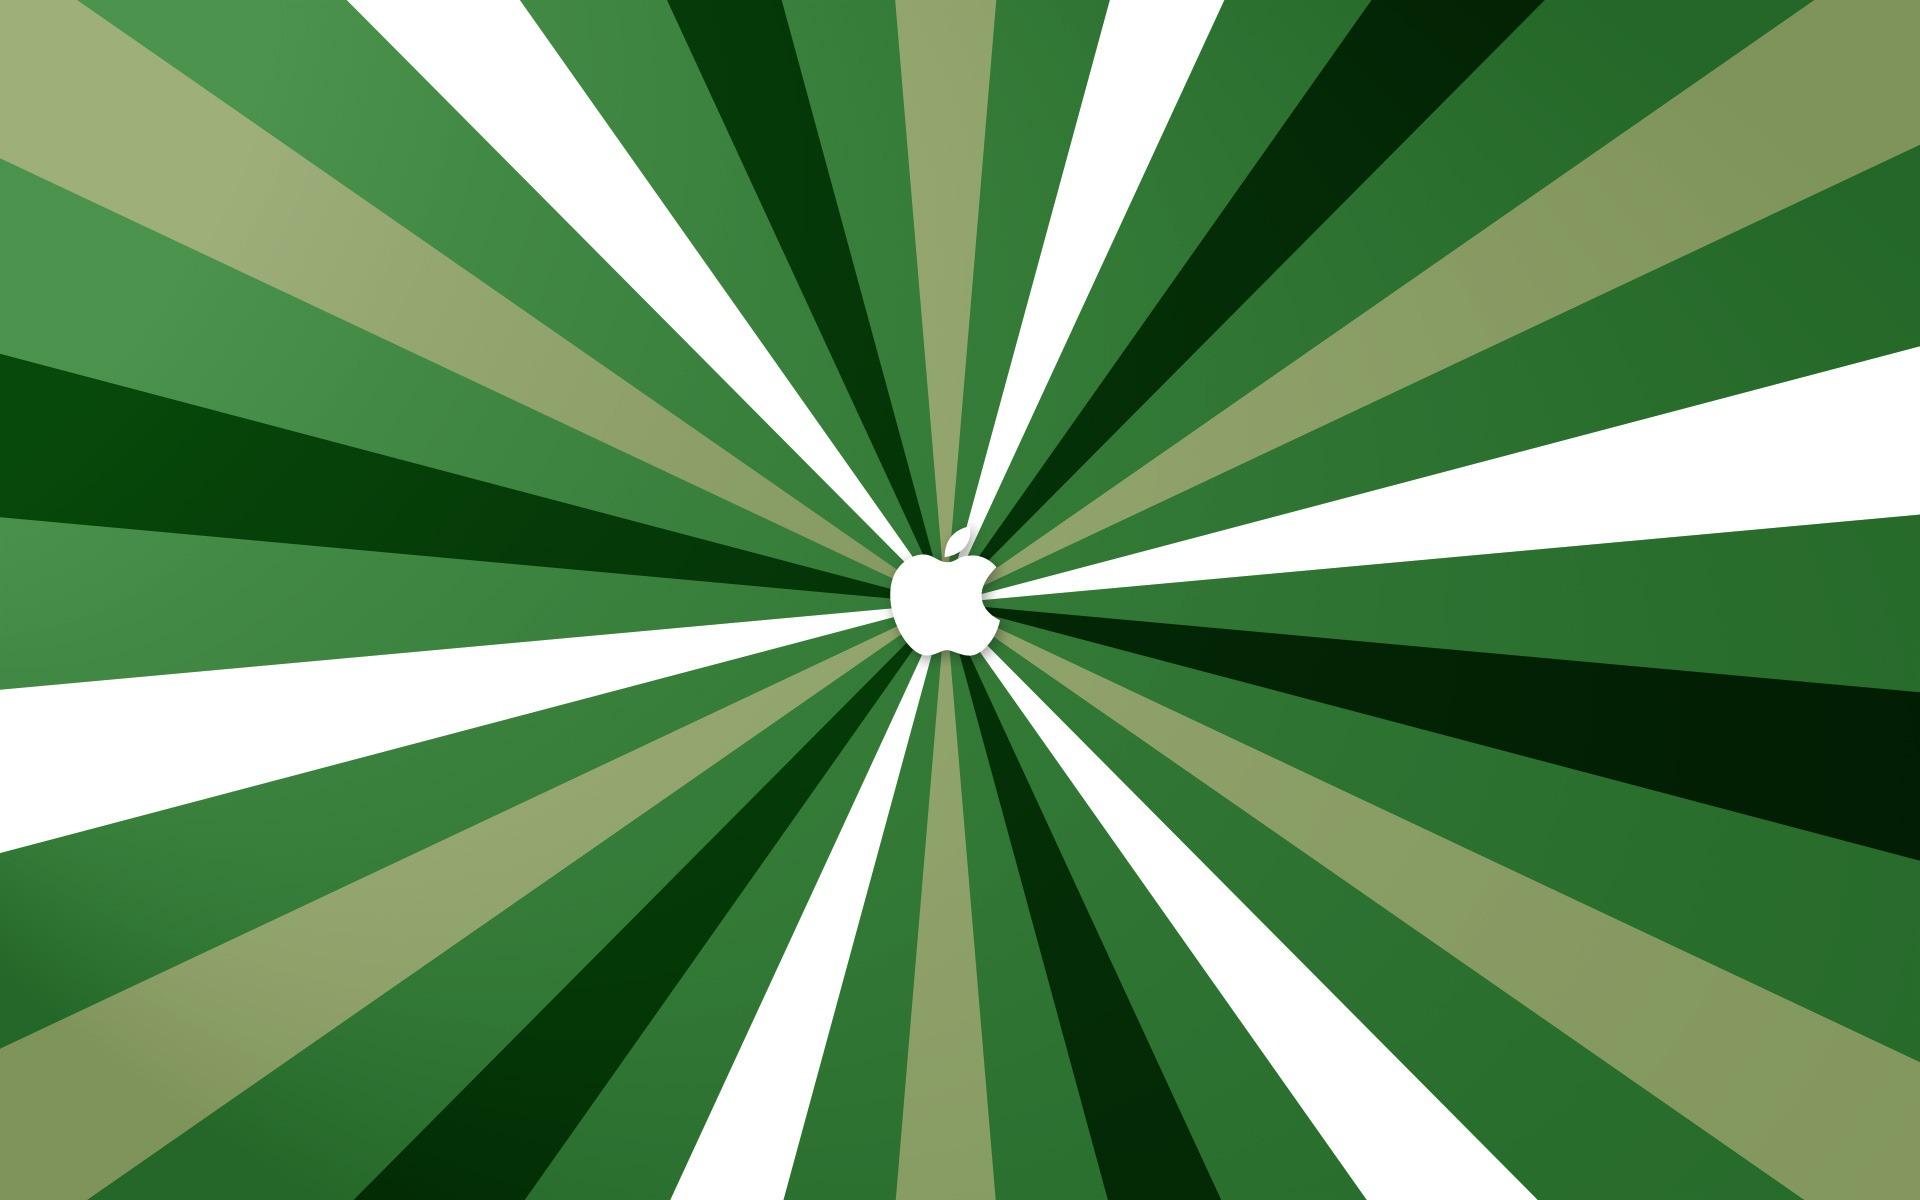 wallpaper green apple stripes pictures gallery fullsize 1920x1200